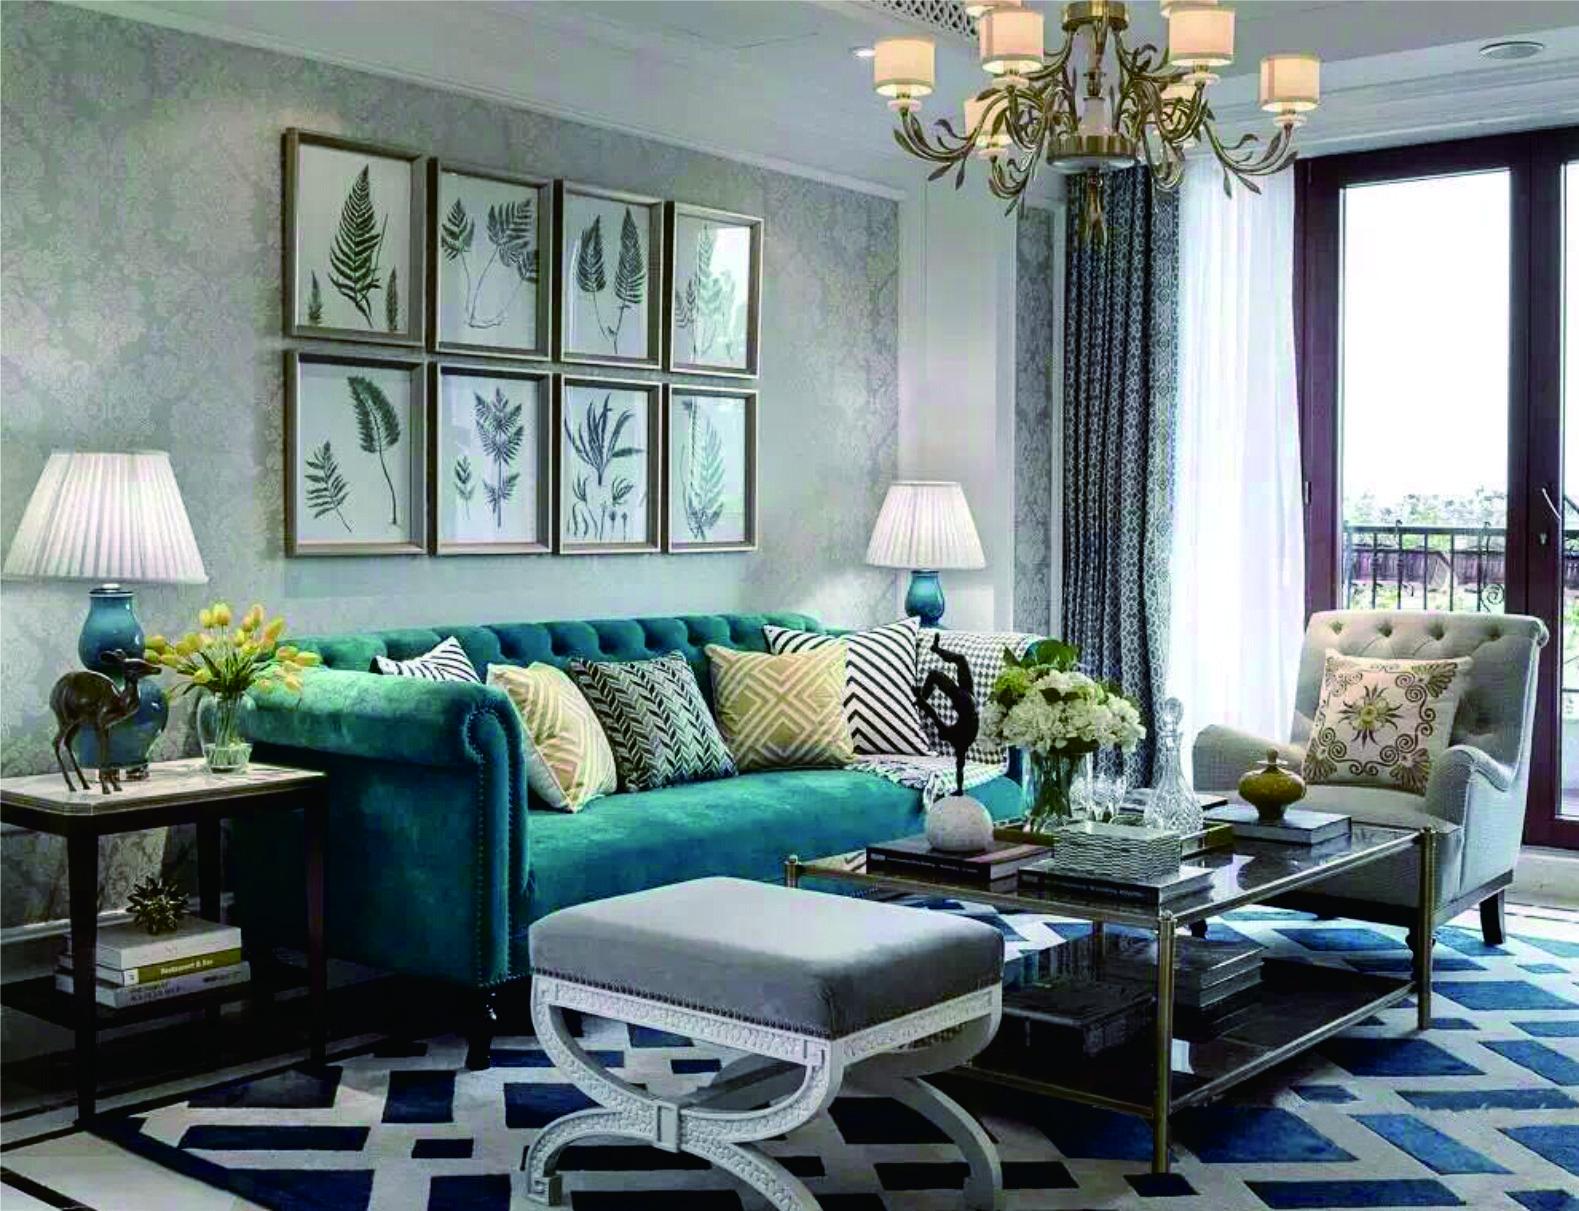 Interiordesign inspiration livingroomideas turquoise room living room decor